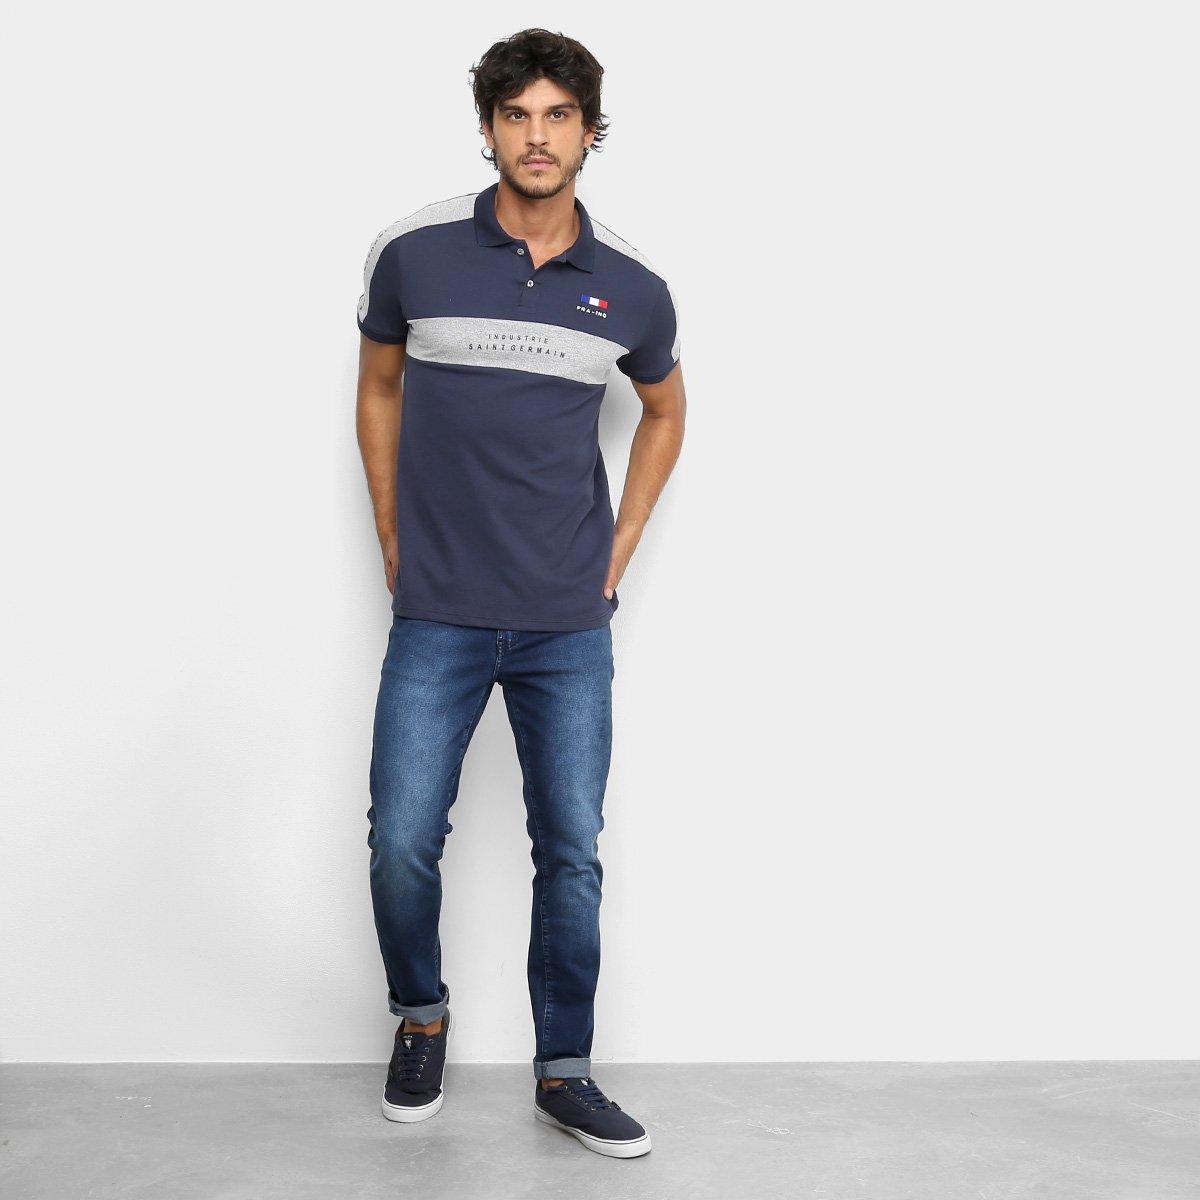 Camisa Polo Industrie Saint Germain Masculina - Marinho